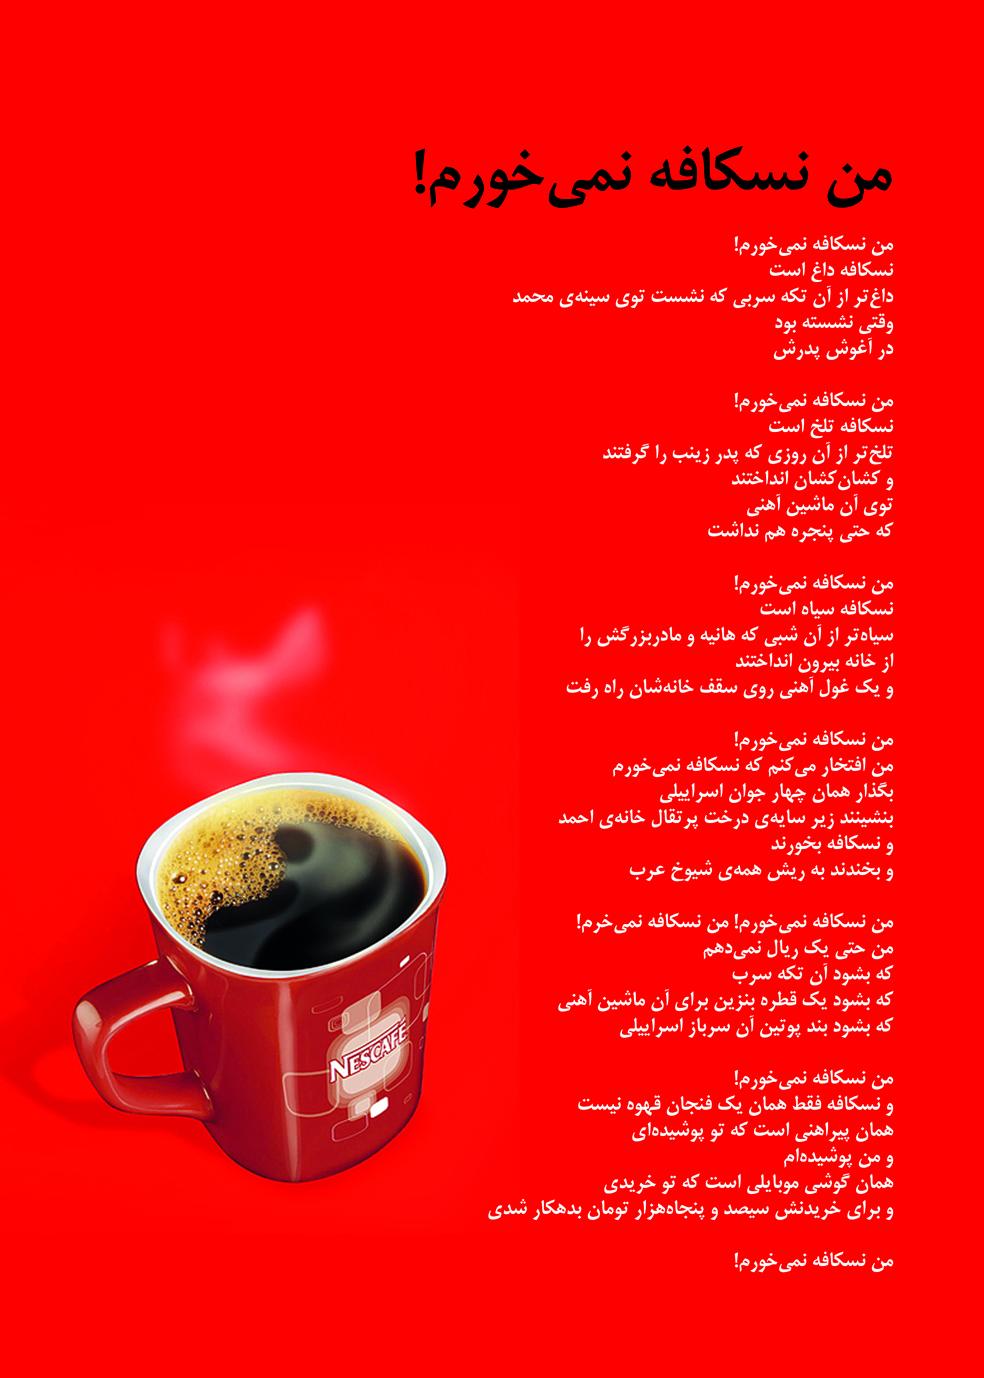 http://sobhegharib3.persiangig.com/image/namayeshgah/c5.jpg